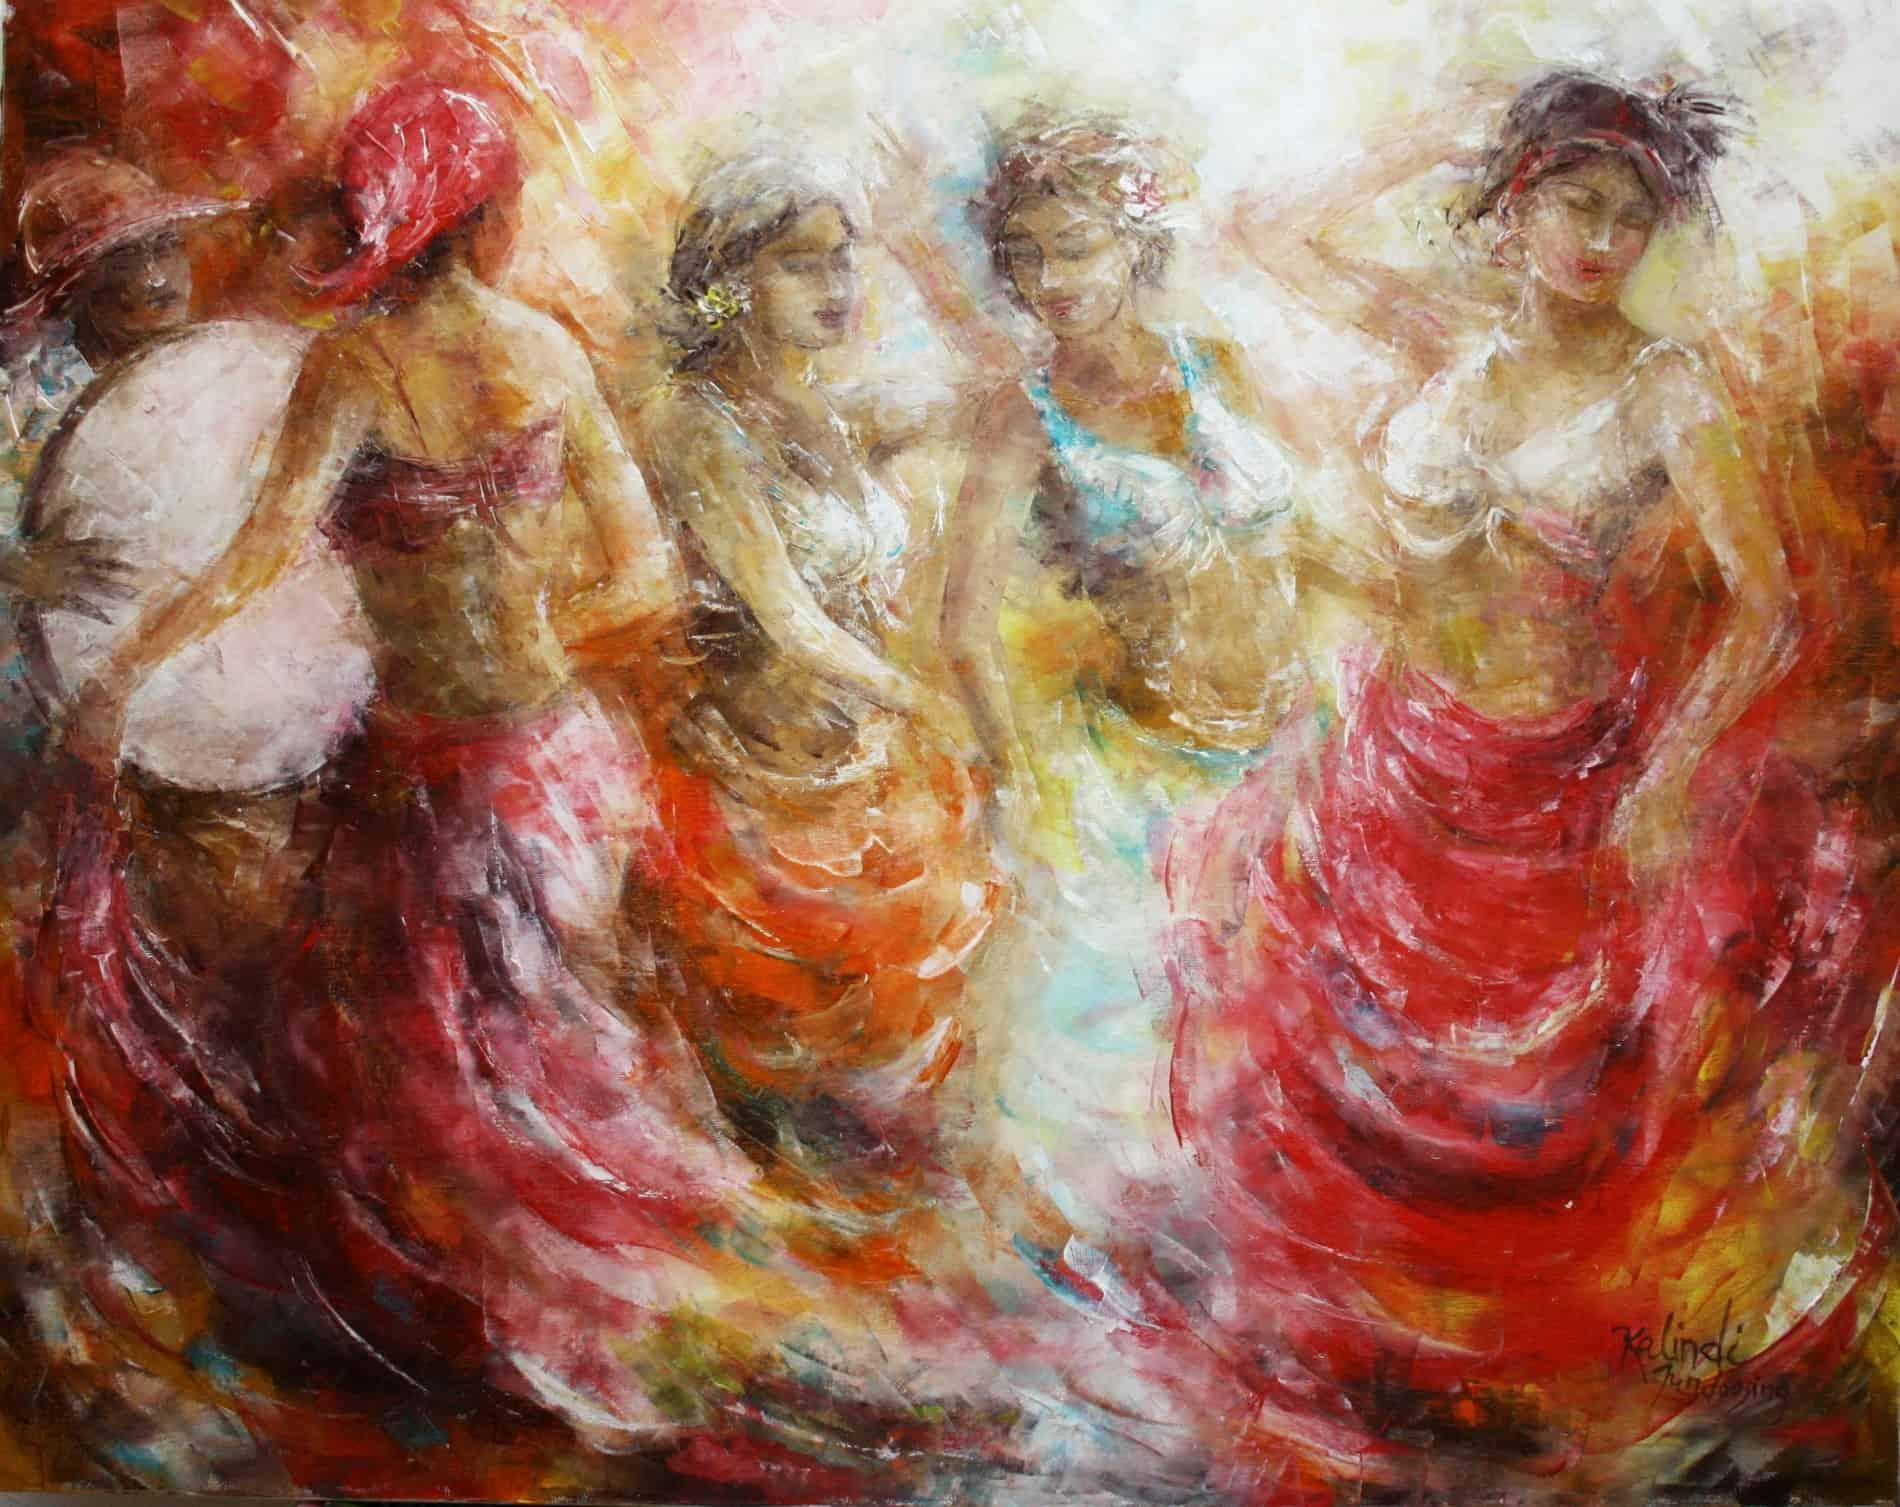 Mauritius Arts & Artists - mauritius-arts-kalindi-jundoosing-sega-dancers